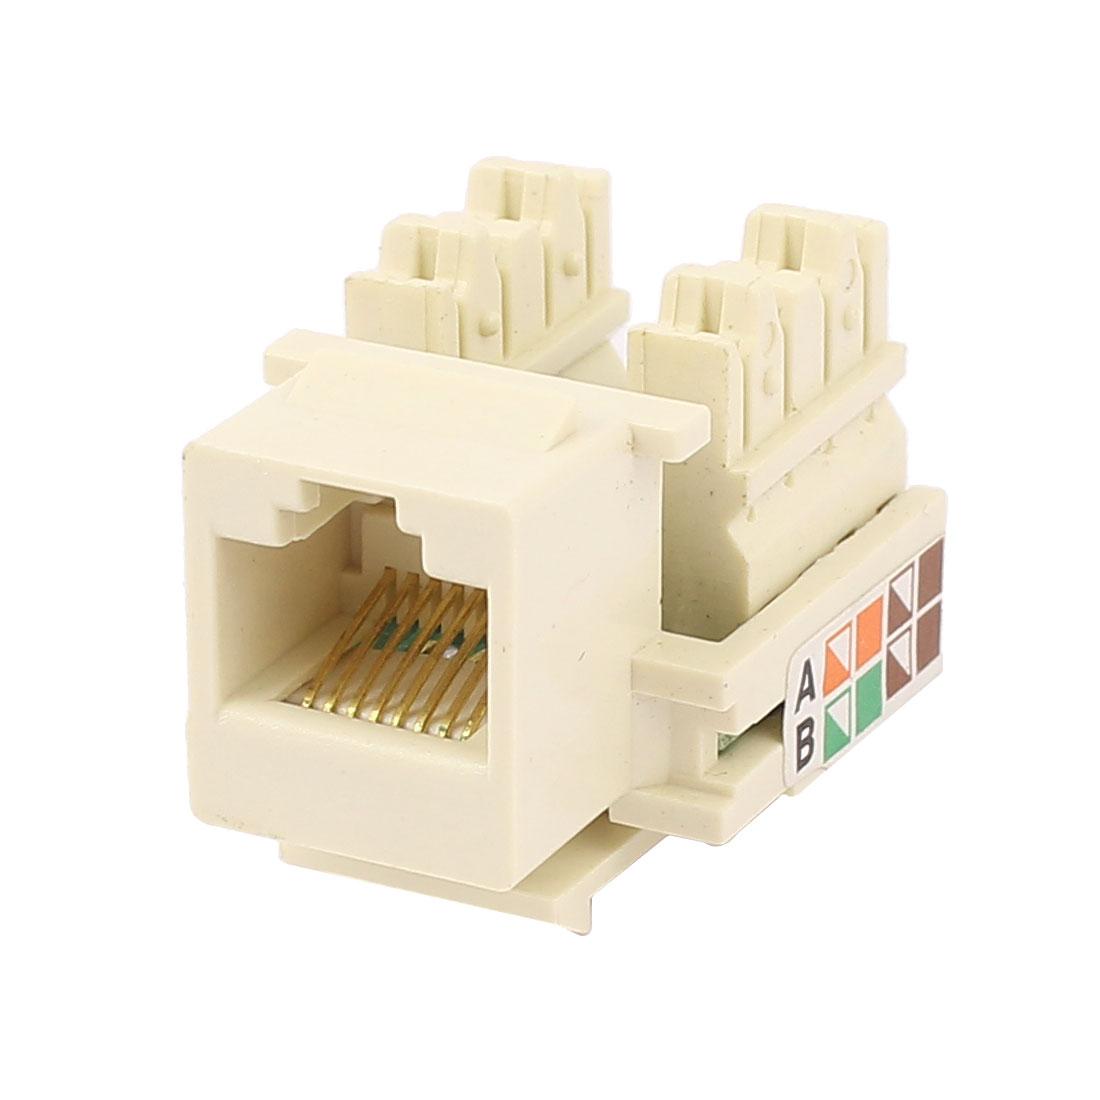 Newtwork Ethernet Lan Cable Joiner Connector RJ45 CAT5E Extender Plug